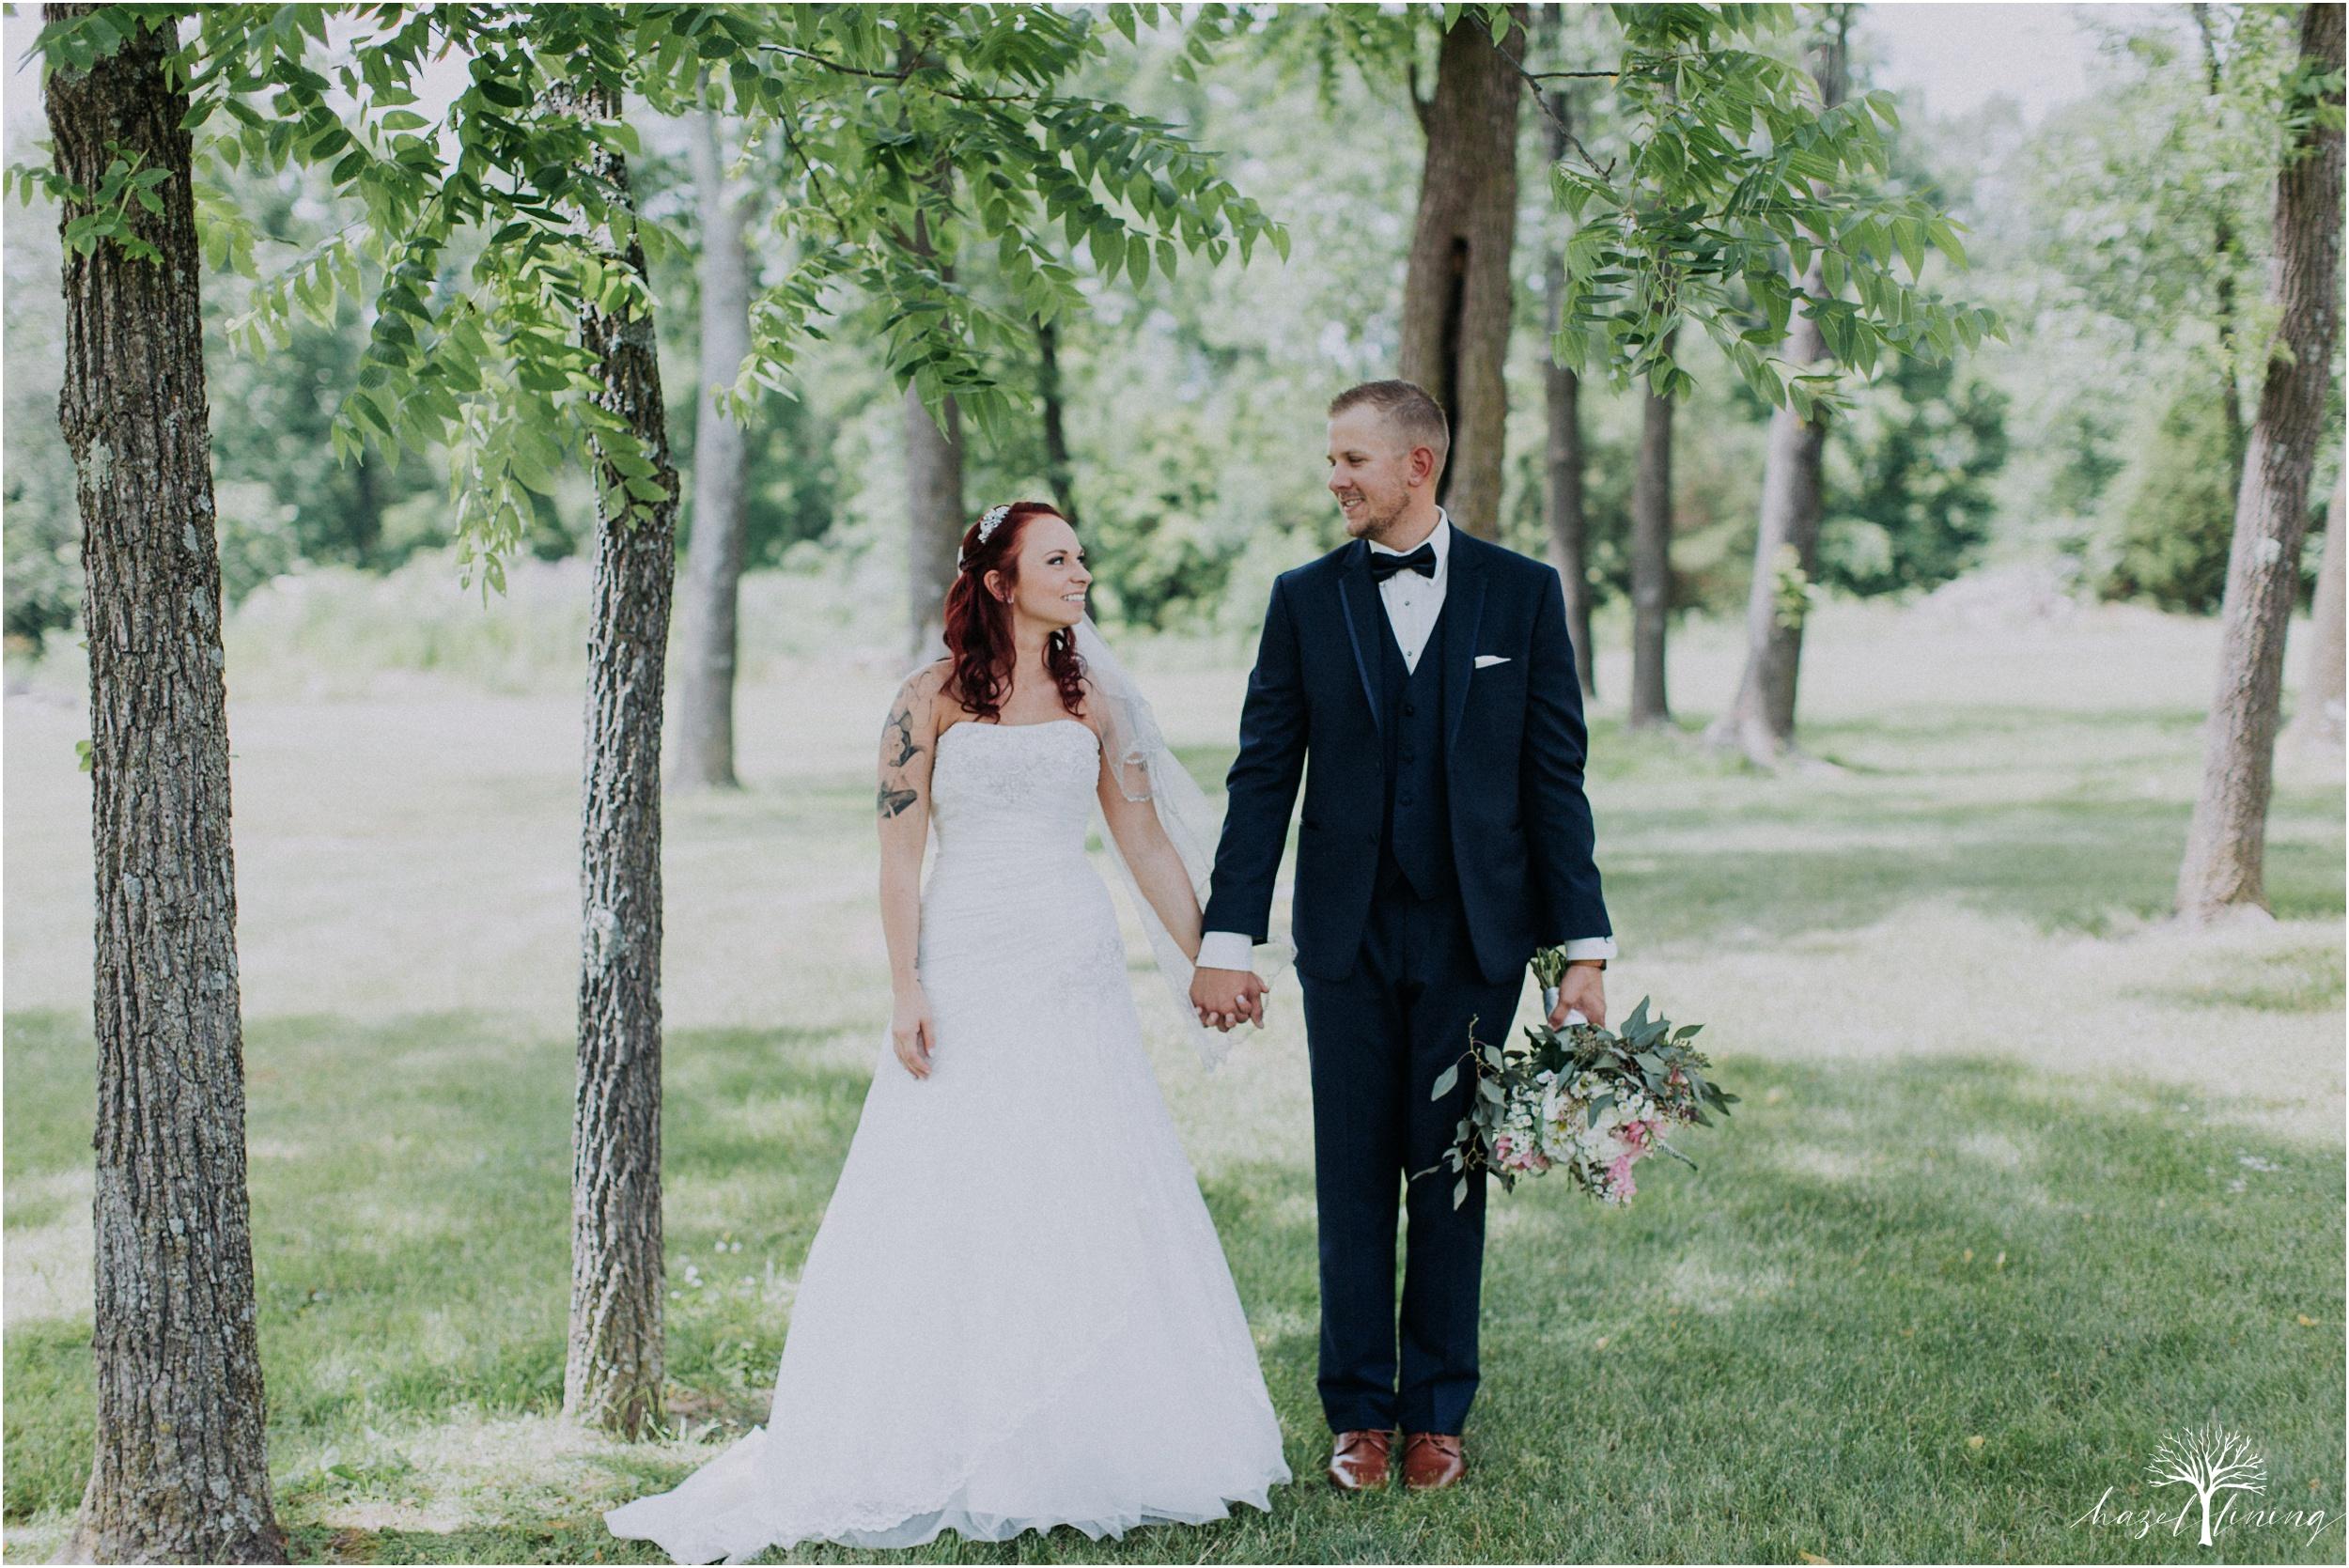 alyssa-james-stiteler-wedding-loft-and-sweet-water-cc-pennsburg-pennsylvania-hazel-lining-travel-wedding-elopement-photography_0044.jpg